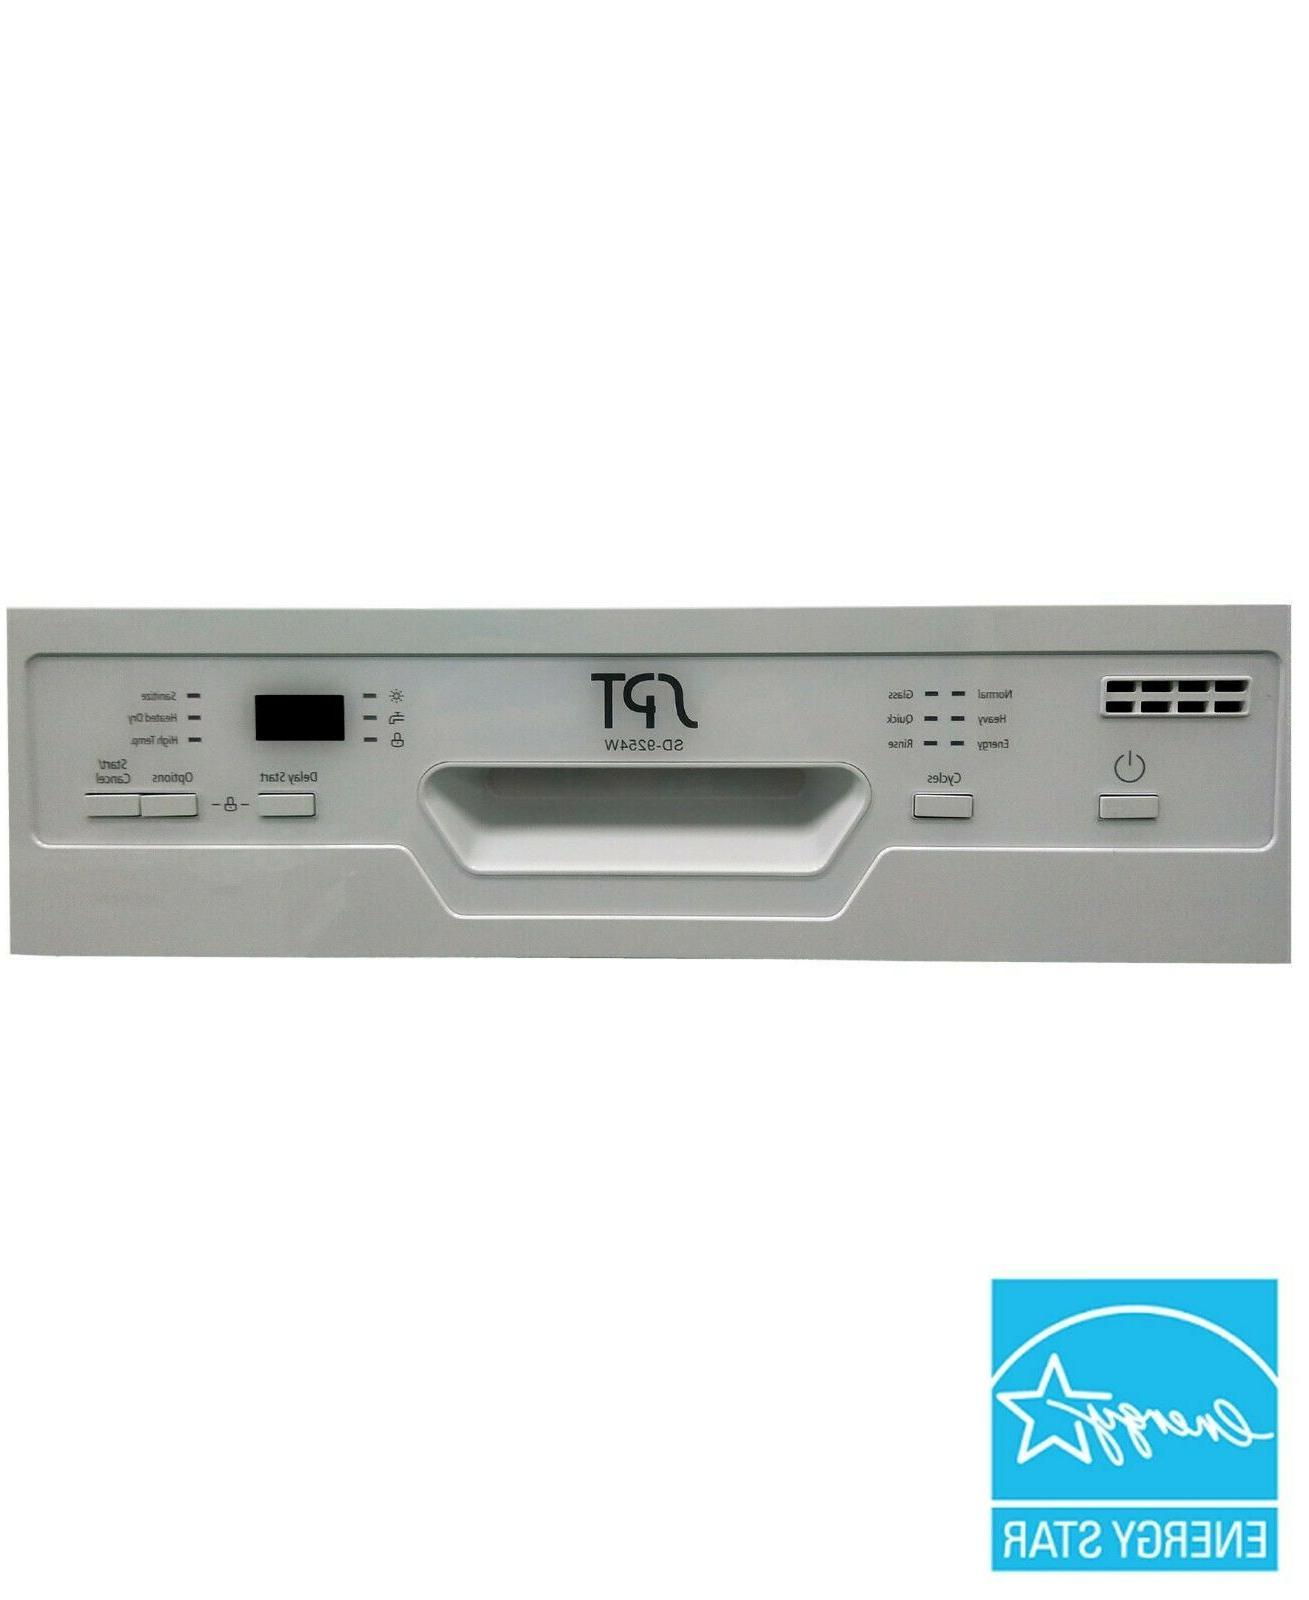 "Sunpentown 18"" Dishwasher w/Heating Drying - White"